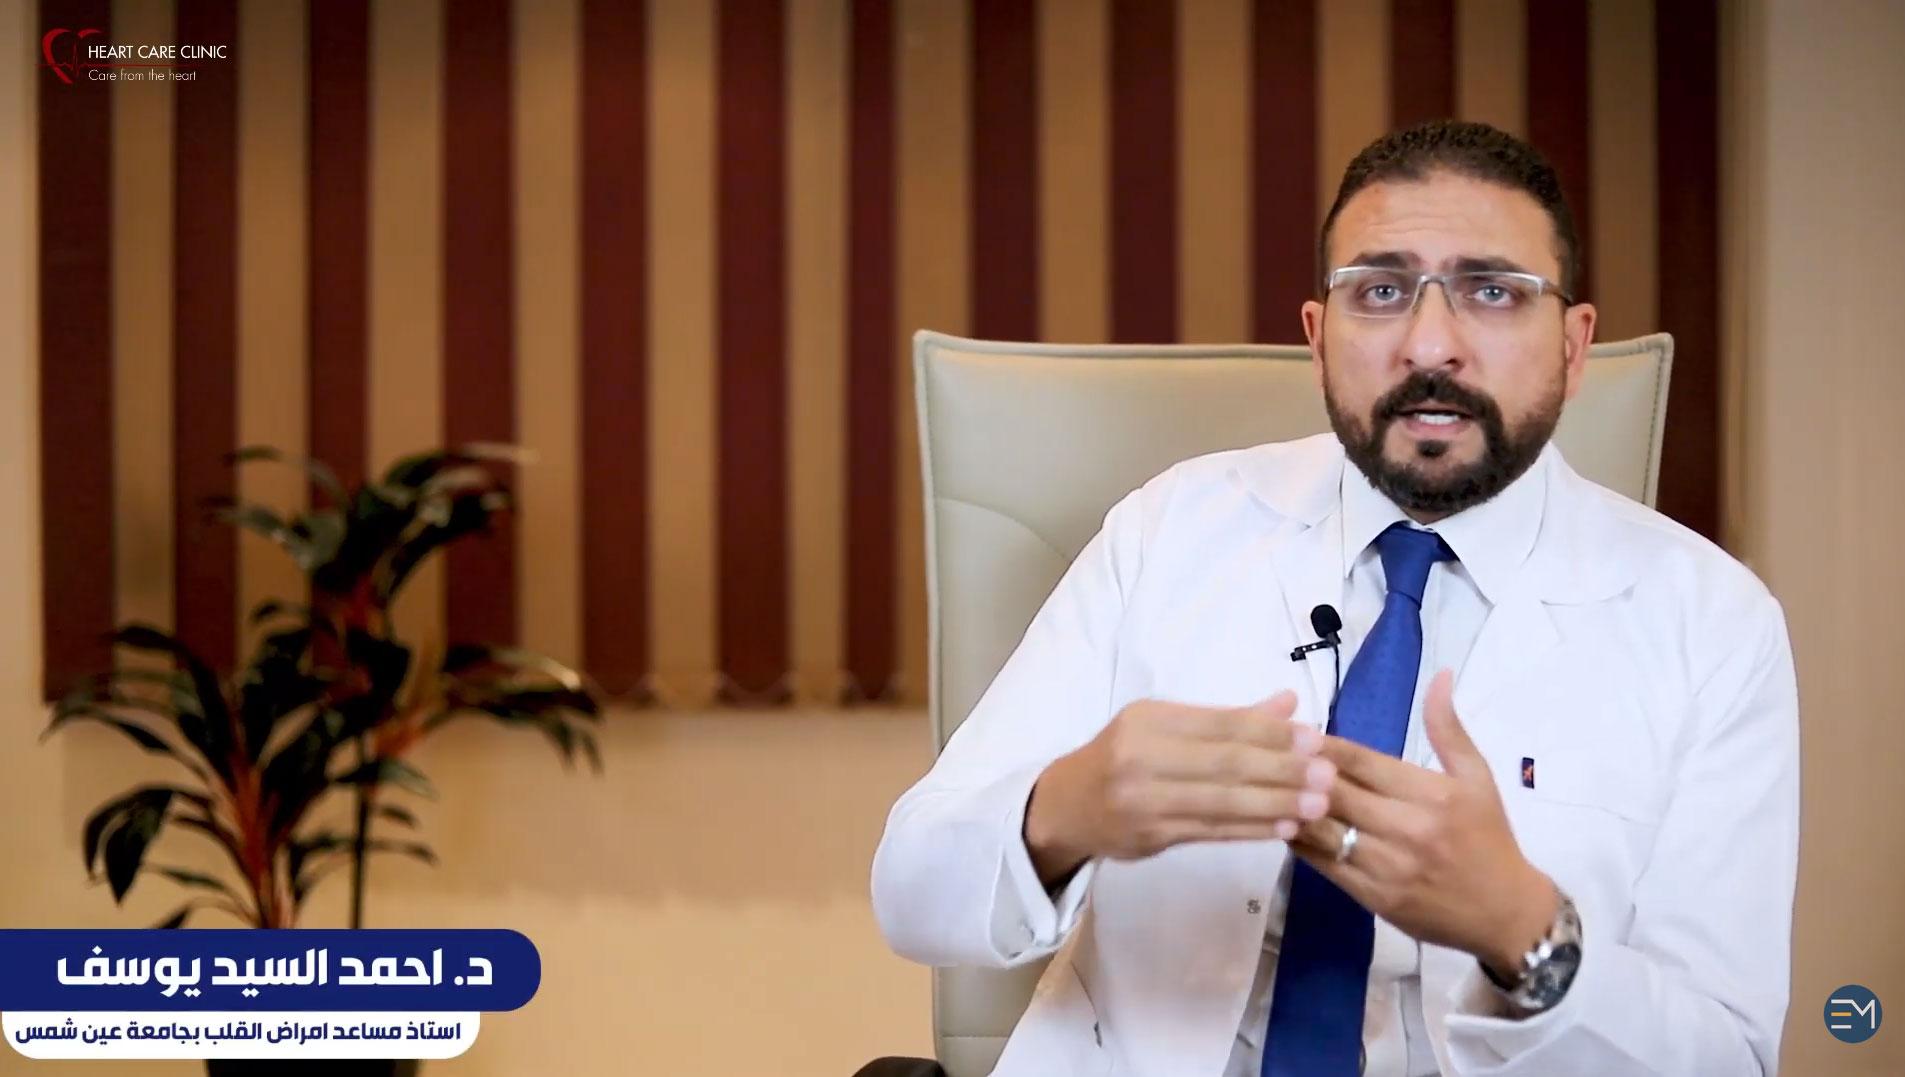 dr.ahmed el sayed - إنتاج الفيديوهات -